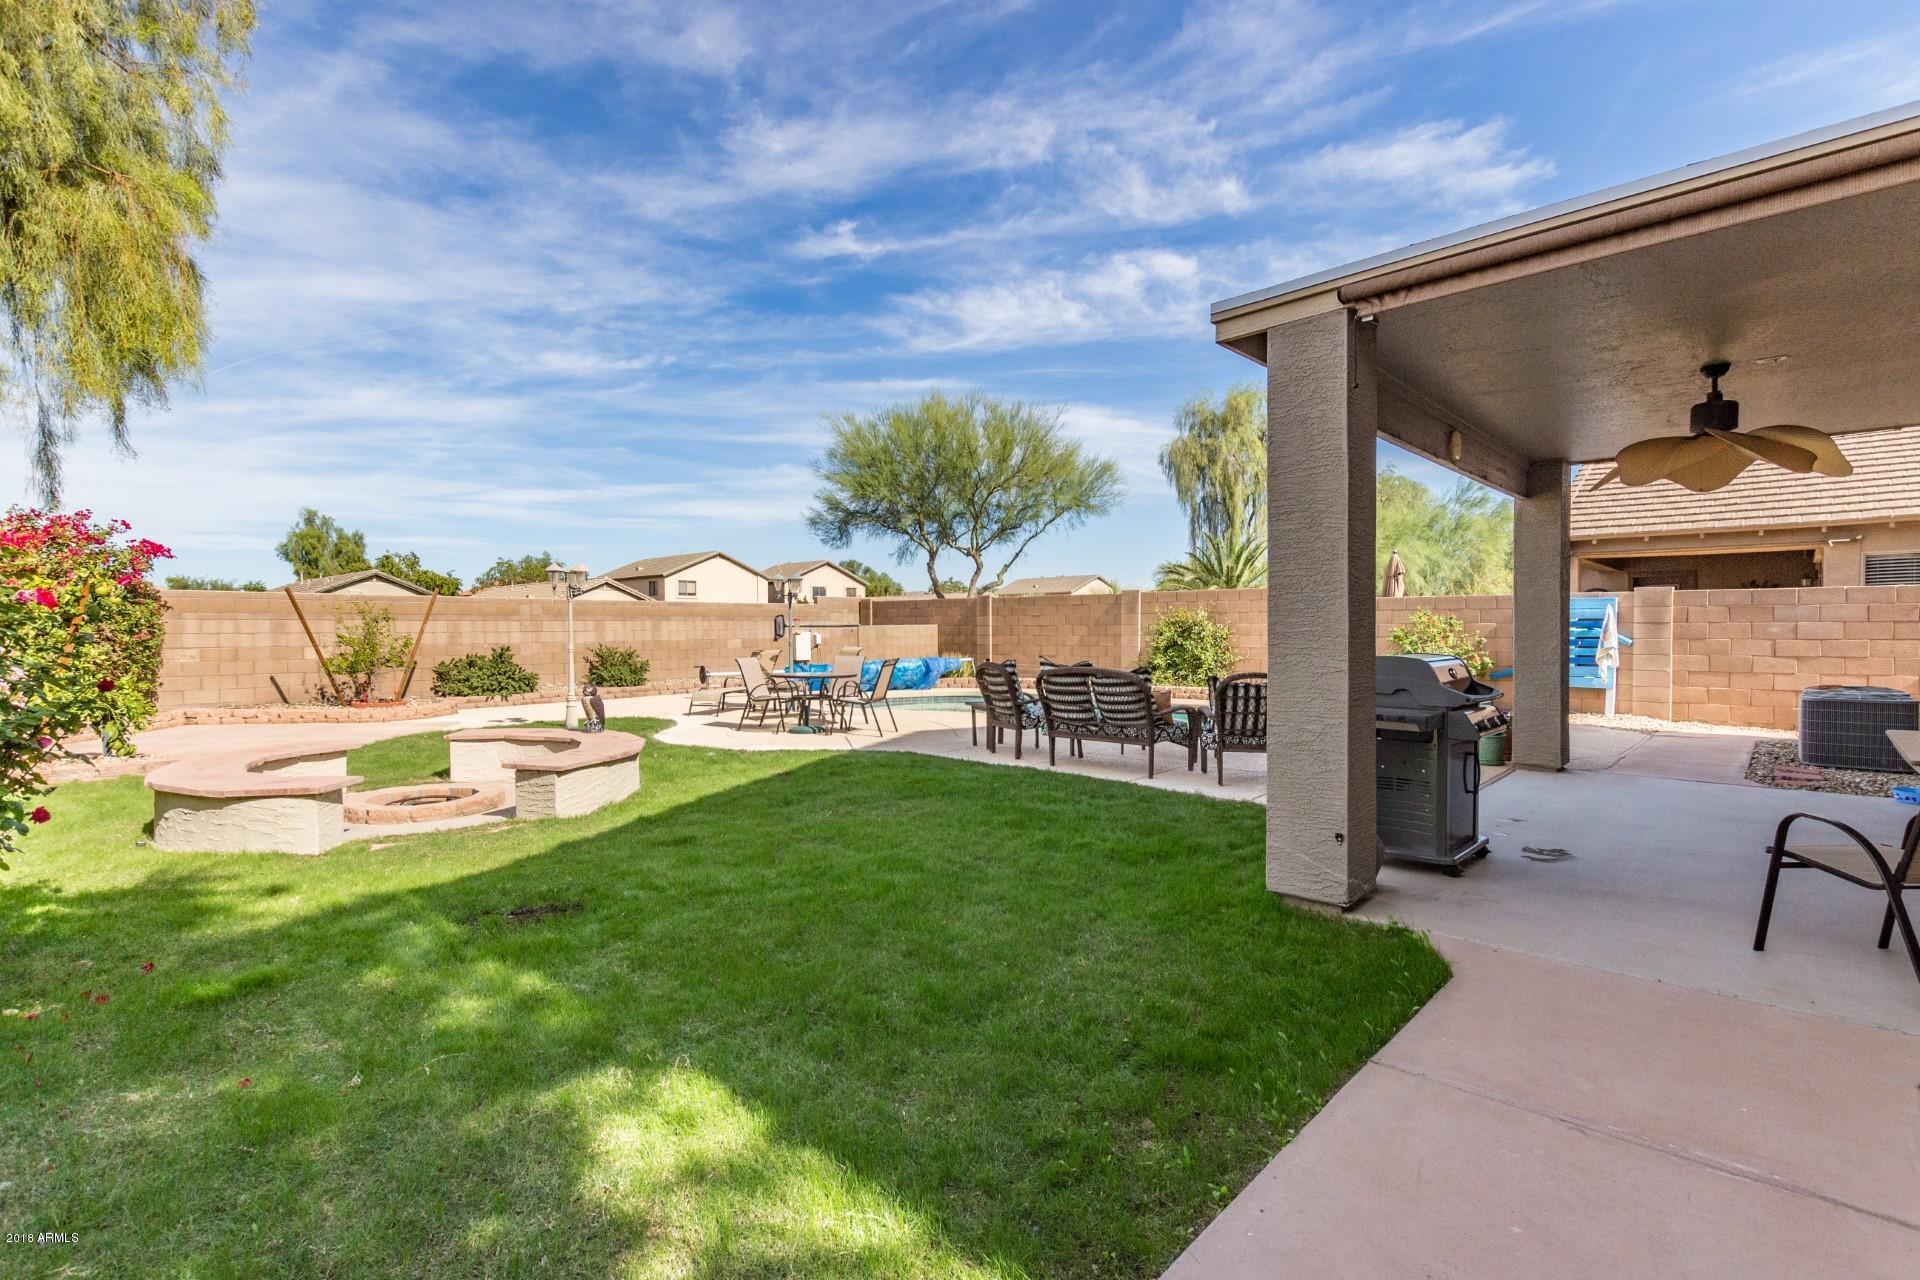 MLS 5839776 42488 W Venture Road, Maricopa, AZ 85138 Maricopa AZ Golf